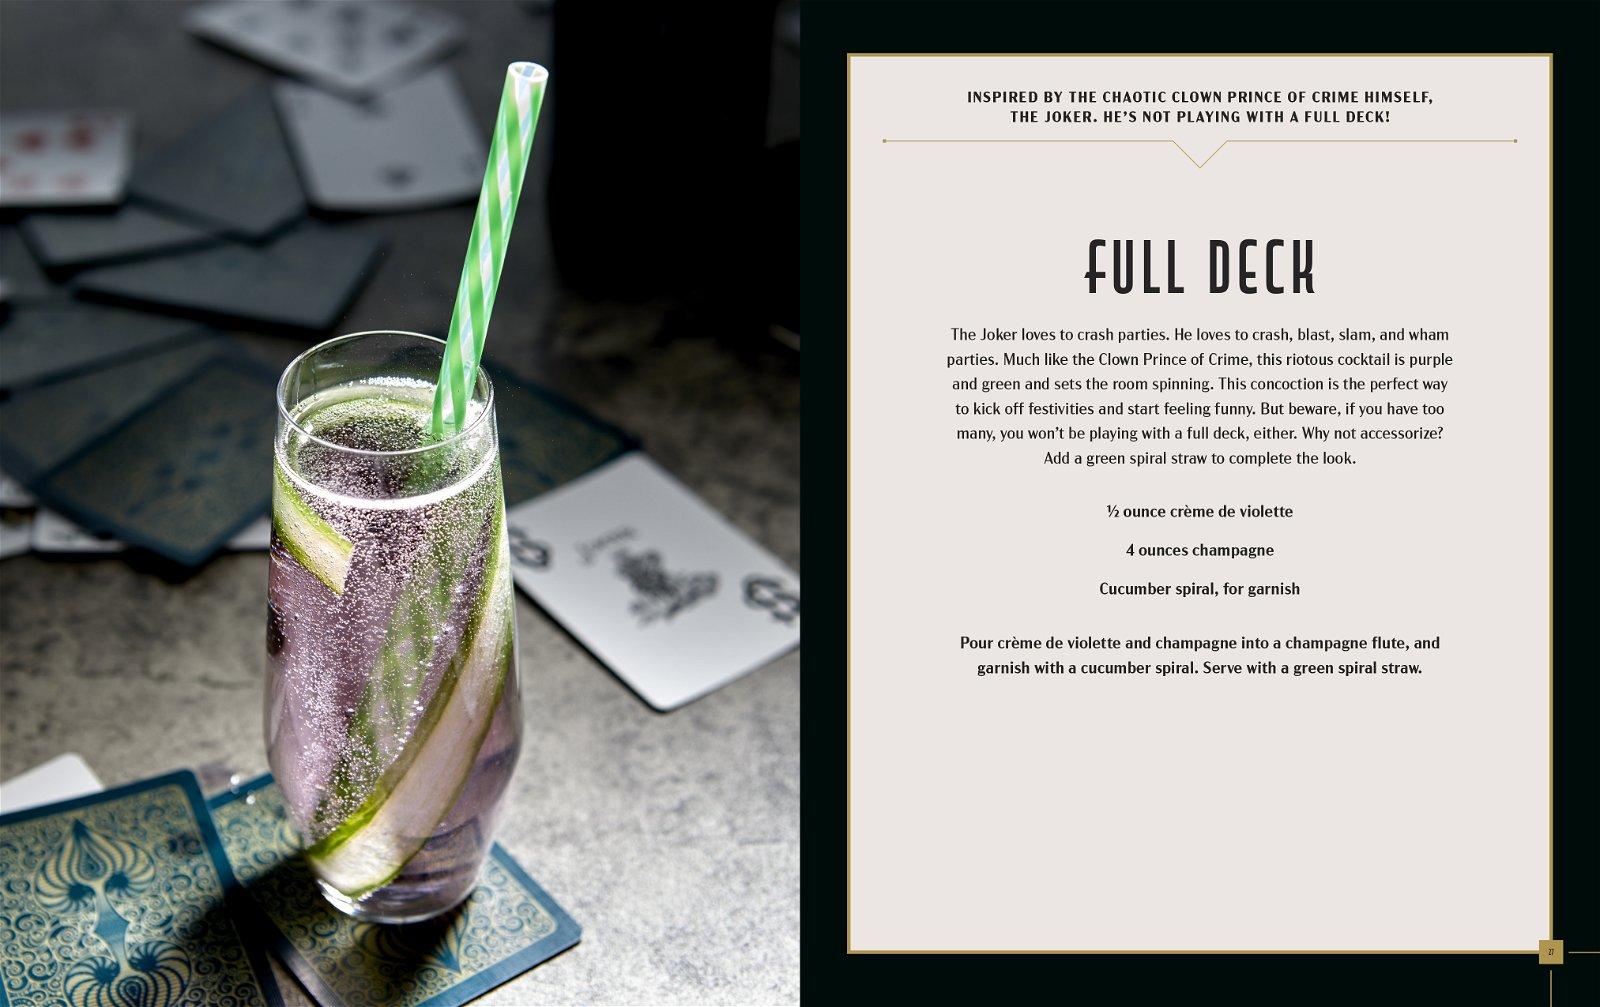 Gotham City Cocktails, Full Deck